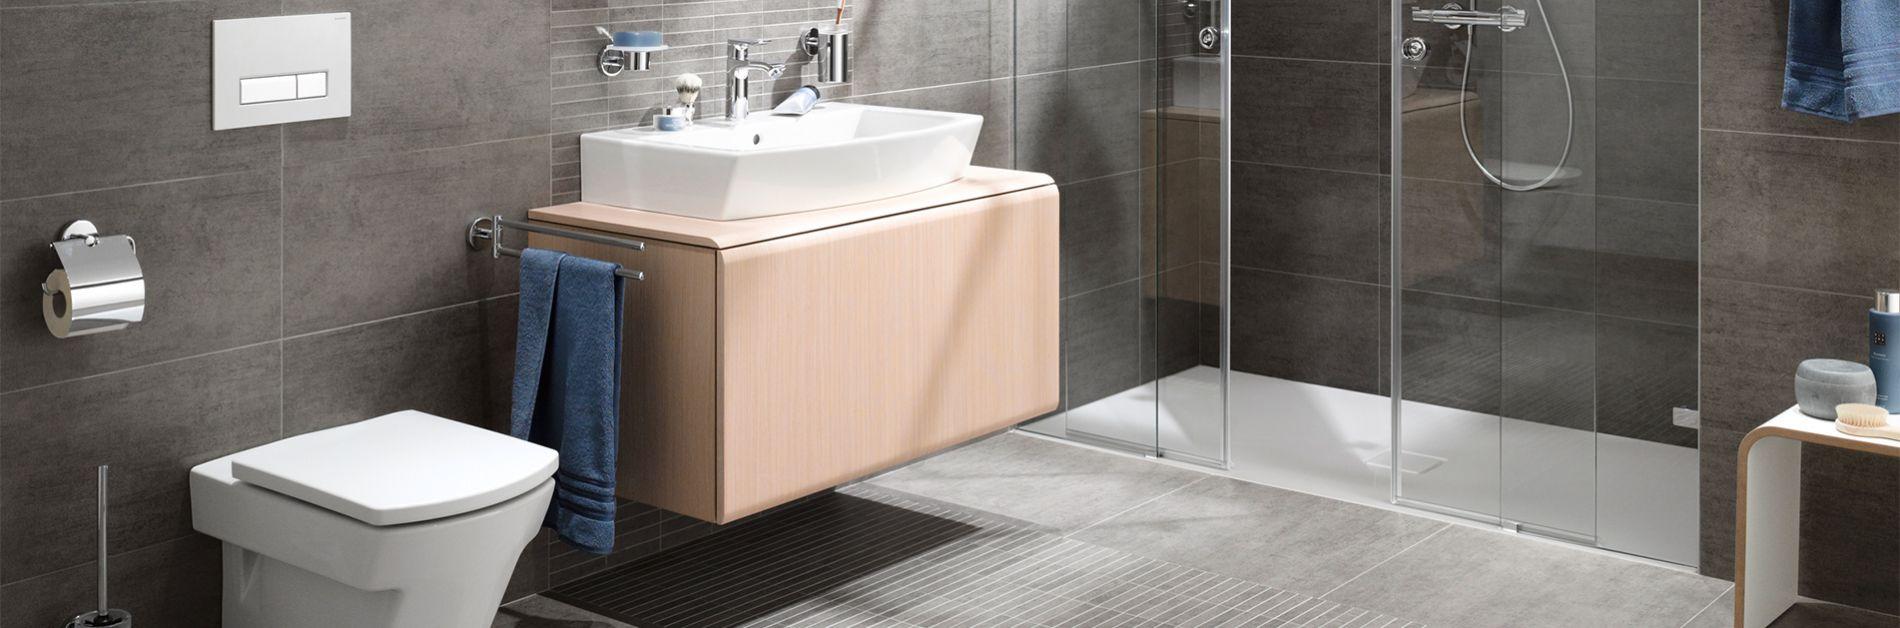 Badezimmer - Fliesen Ecker